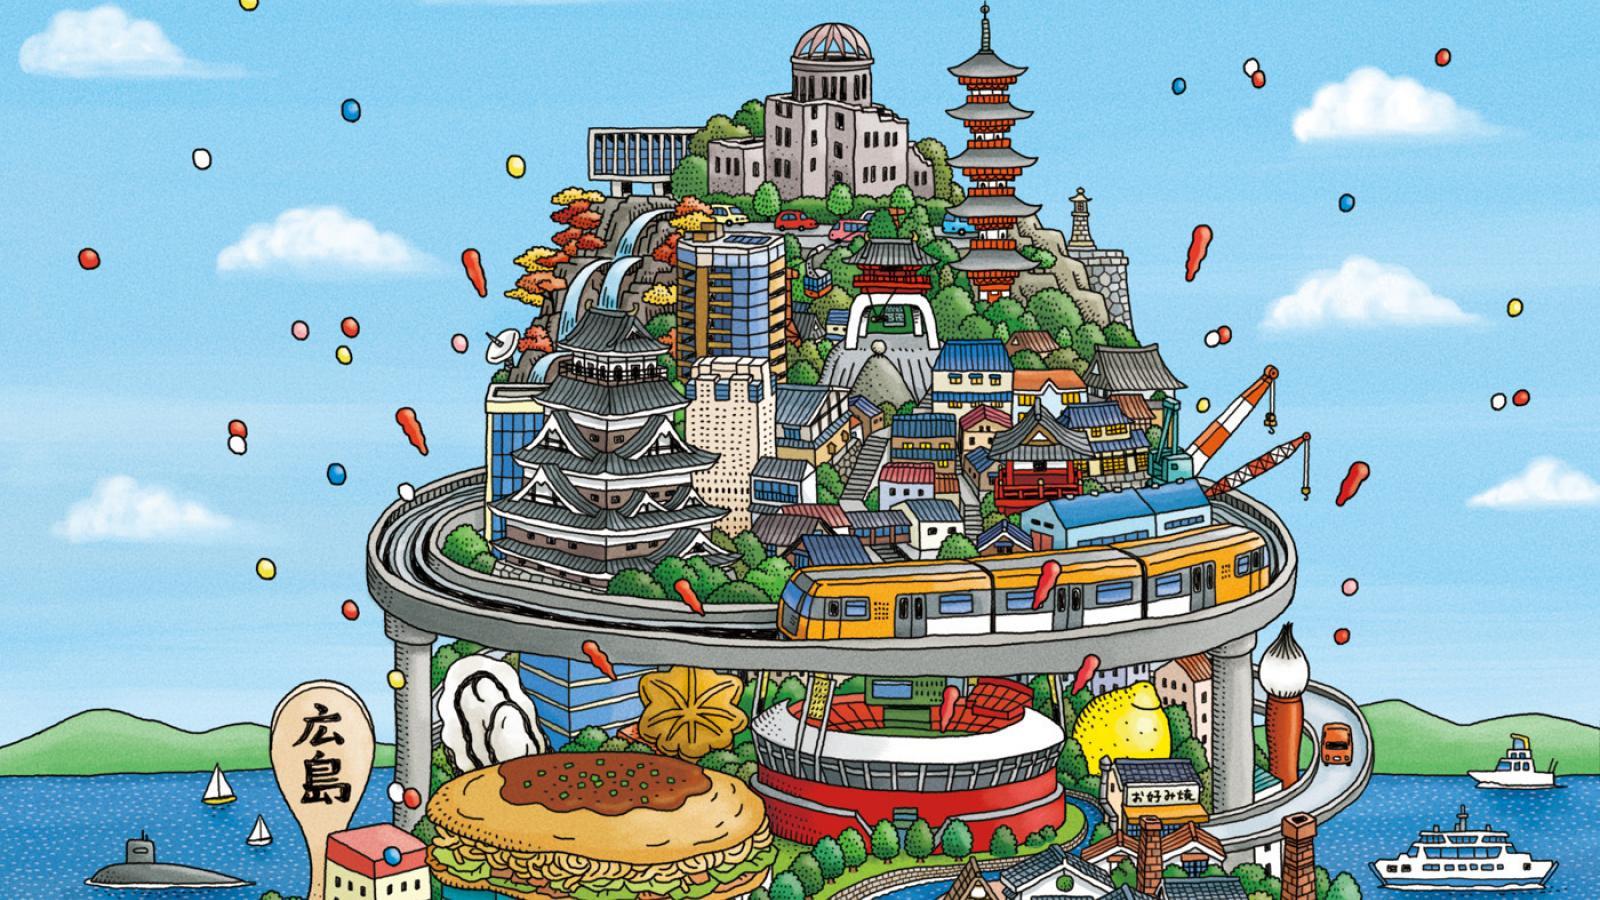 Hiroshima Ilustración Guía de IC4DESIGN inc.